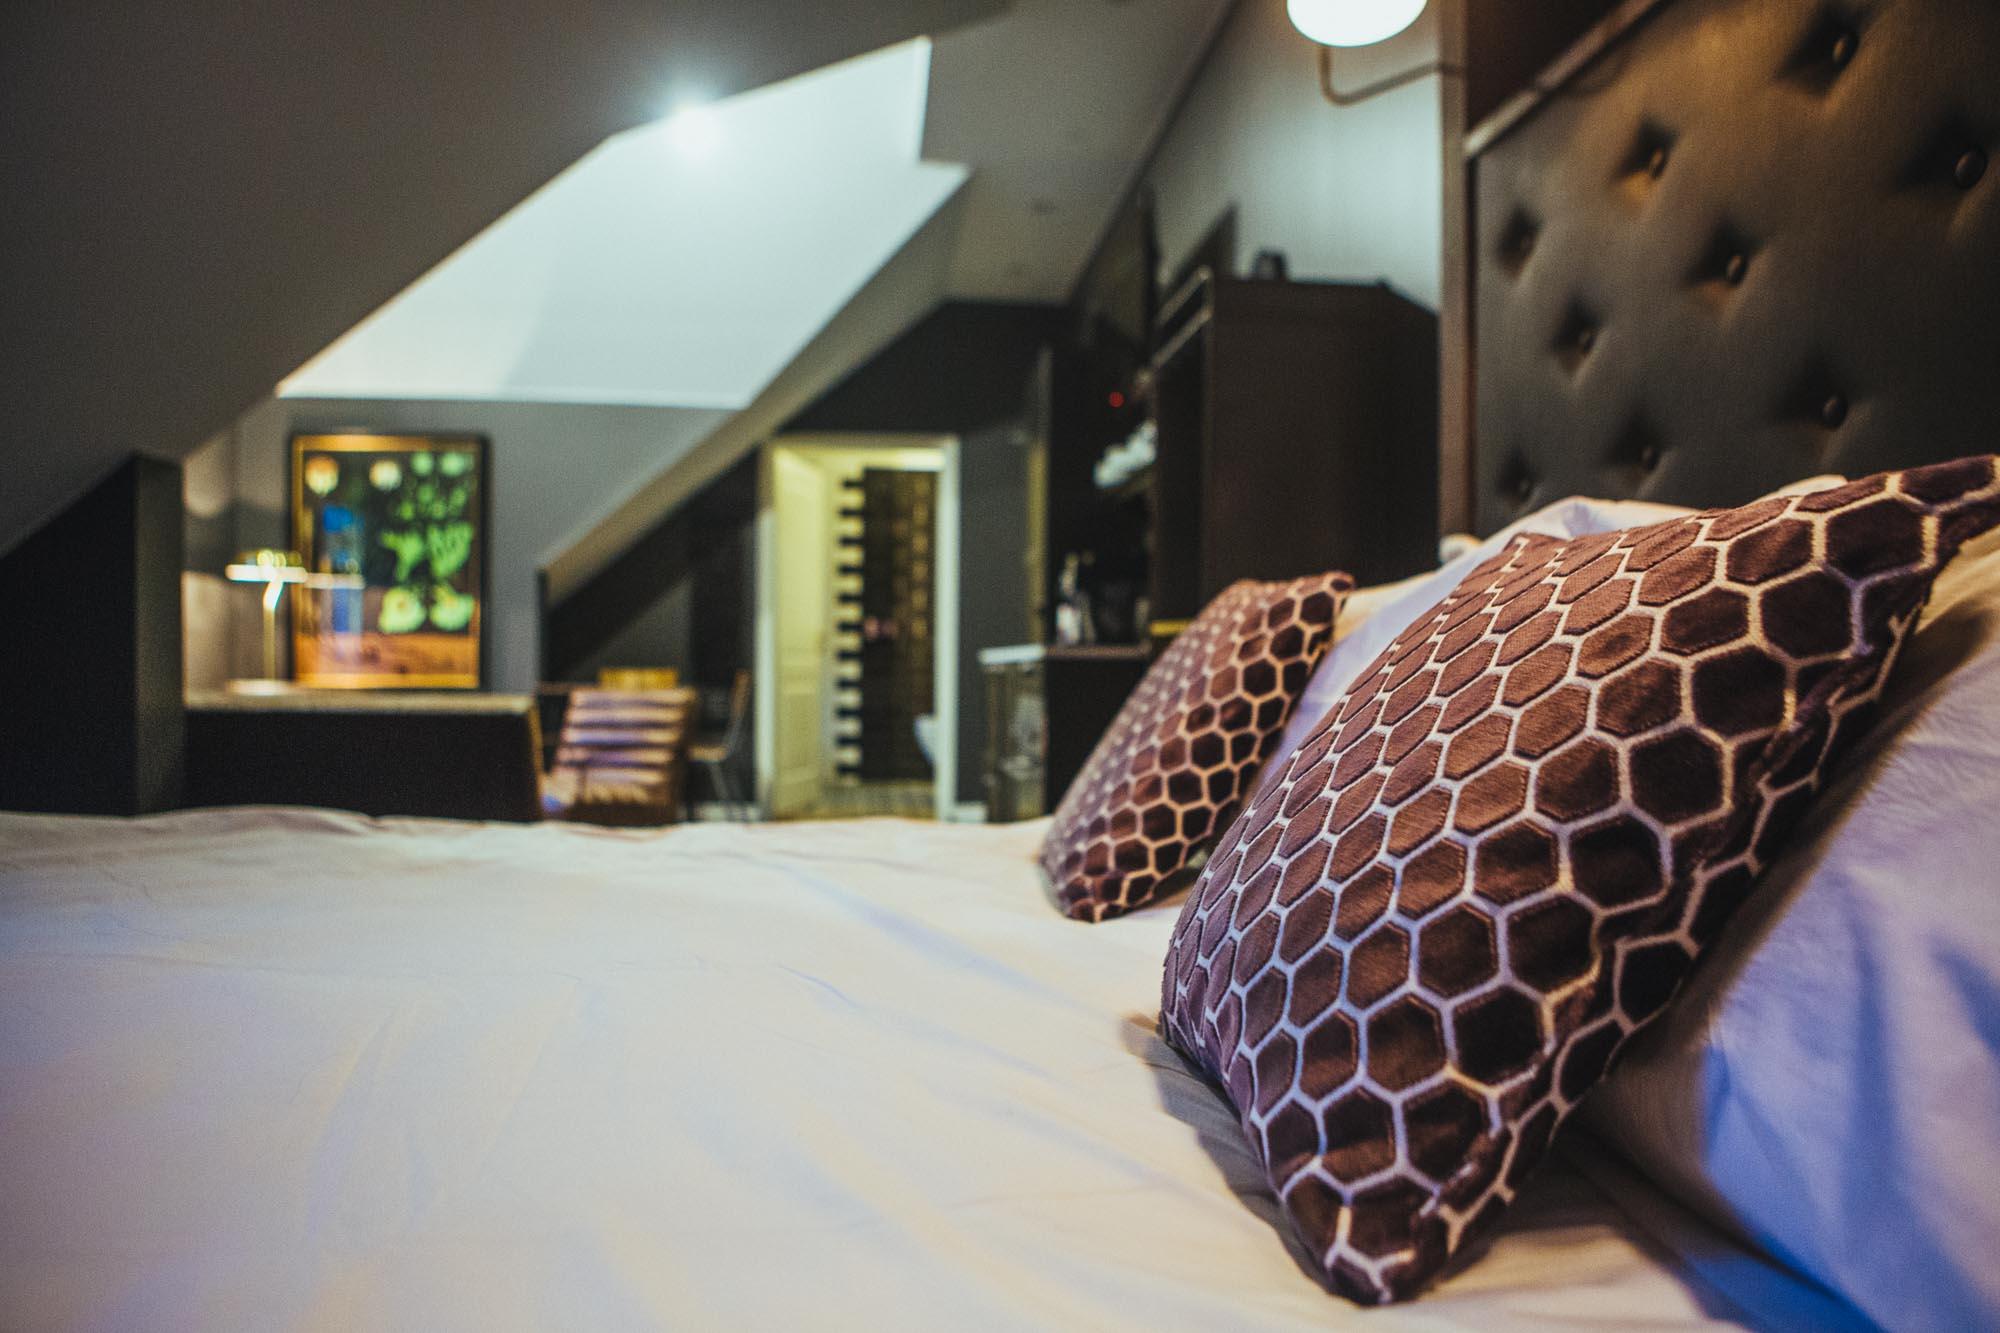 Iceland photo inspiration – No.51 Apartment Hotel, Reykjavik